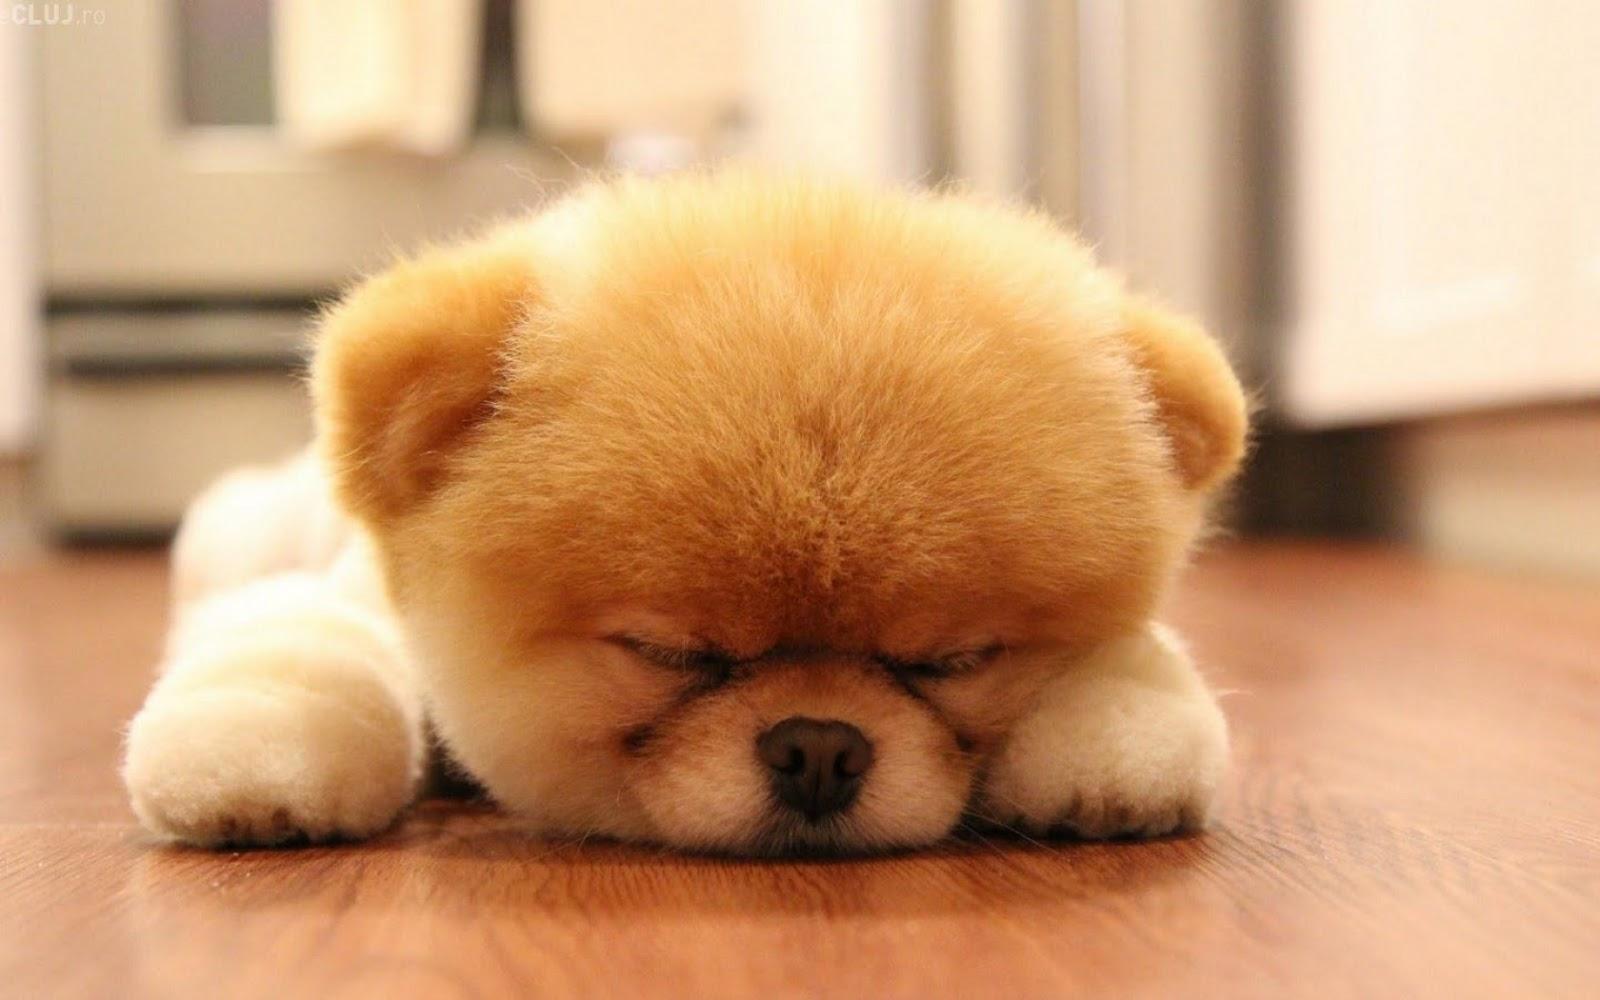 Pic New Posts Boo Dog Wallpaper Hd